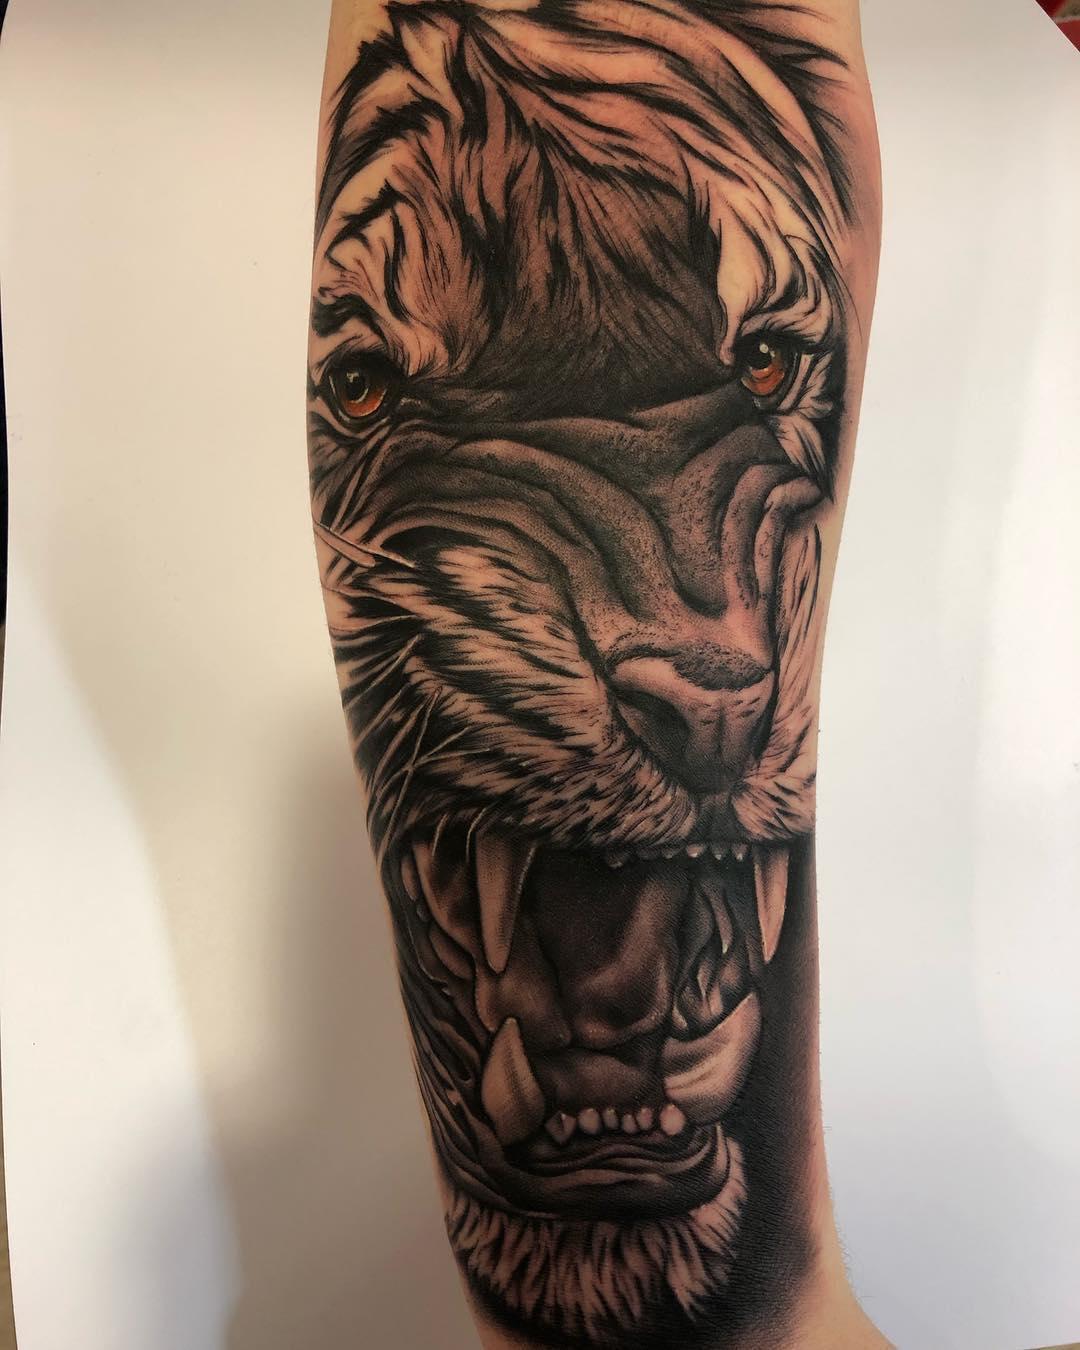 CheyenneTattooEquipment,followforfollow,berlin,followmeciudadreal,ciudadreal,tomelloso,almagro,puertollano,tatuajesenpuertollano,tatuajesendaimiel,ciudadrealtattoo,ciudadrealtatuajes,tatuajesciudadreal,follow,ciudadrealtatuajes,puertollano,ciudadreal,tattoos,ciudadrealtattoo,tattooers,besttattooers,juantabasco,ciudadrealsetatua,ink,tatuajes,realismo,realistictattoo,ciudadrealtattoo,tatuajesenpuertollano,traditionaltattoos,castillalamancha,ink,tattooart,zurichtattoo,daimiel,blackandgreytattoo,daimiel,CheyenneTattooEquipment